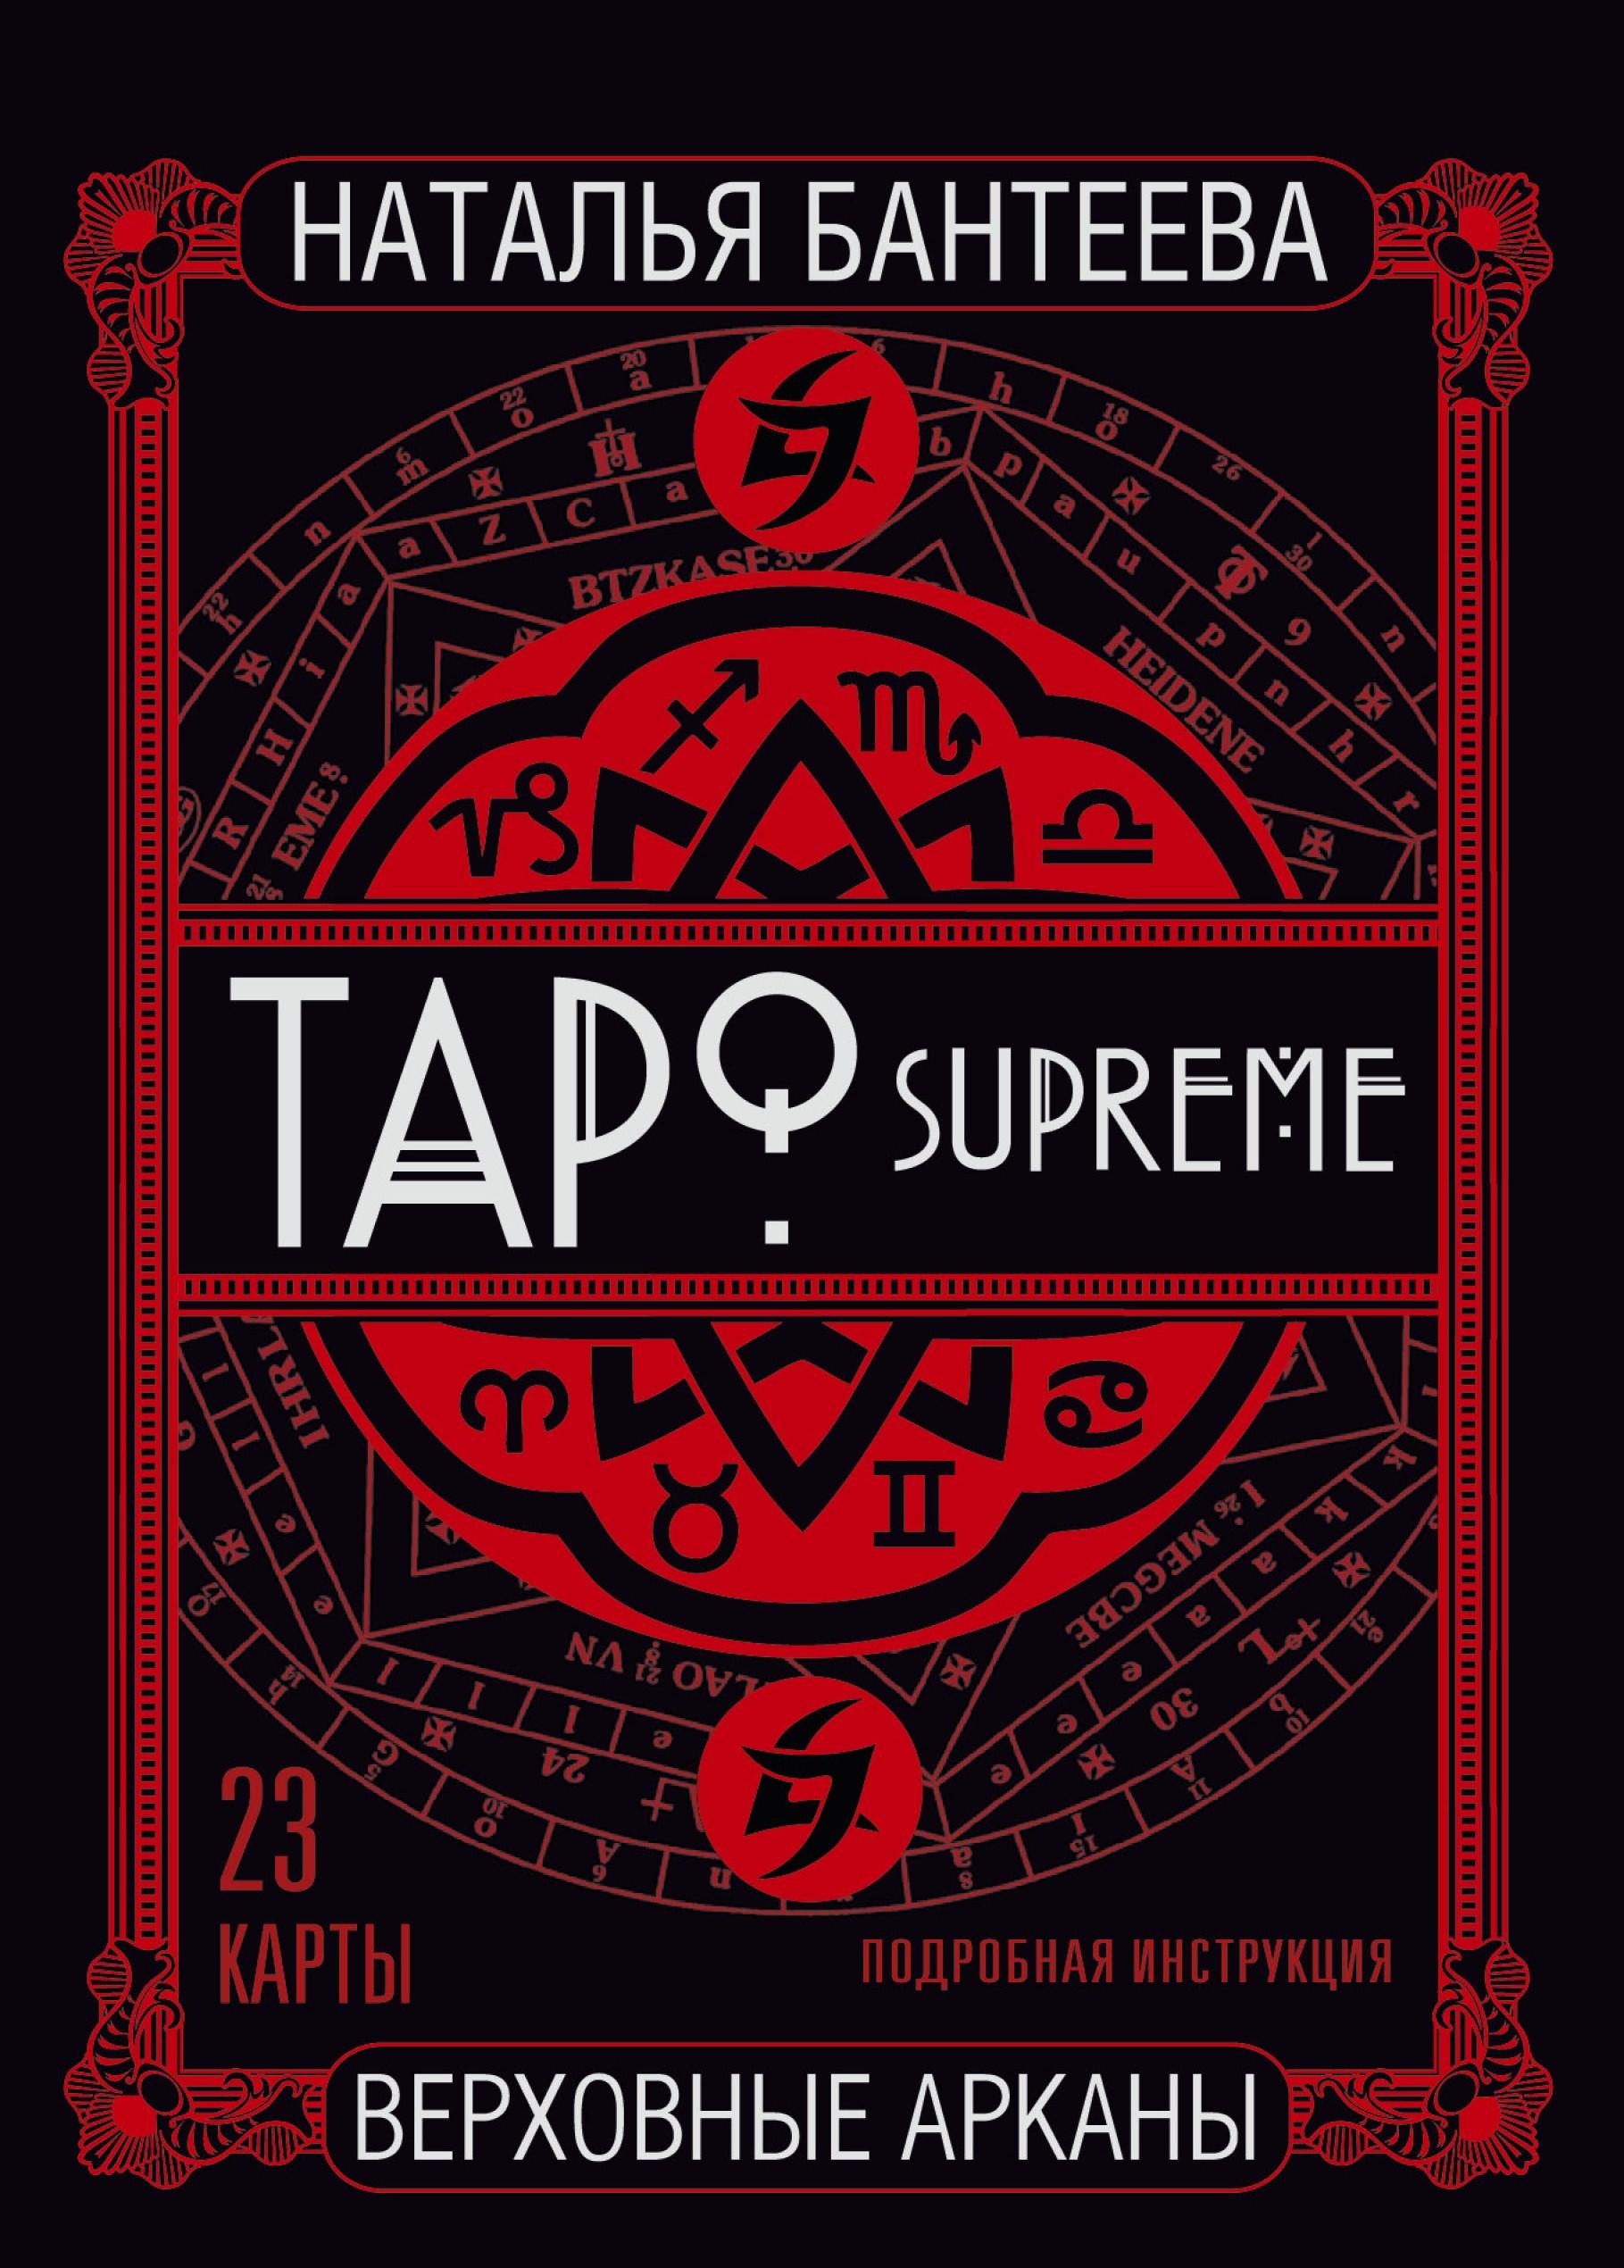 Наталья Бантеева Таро supreme. Верховные арканы наталья бантеева таро supreme верховные арканы набор из 23 карт